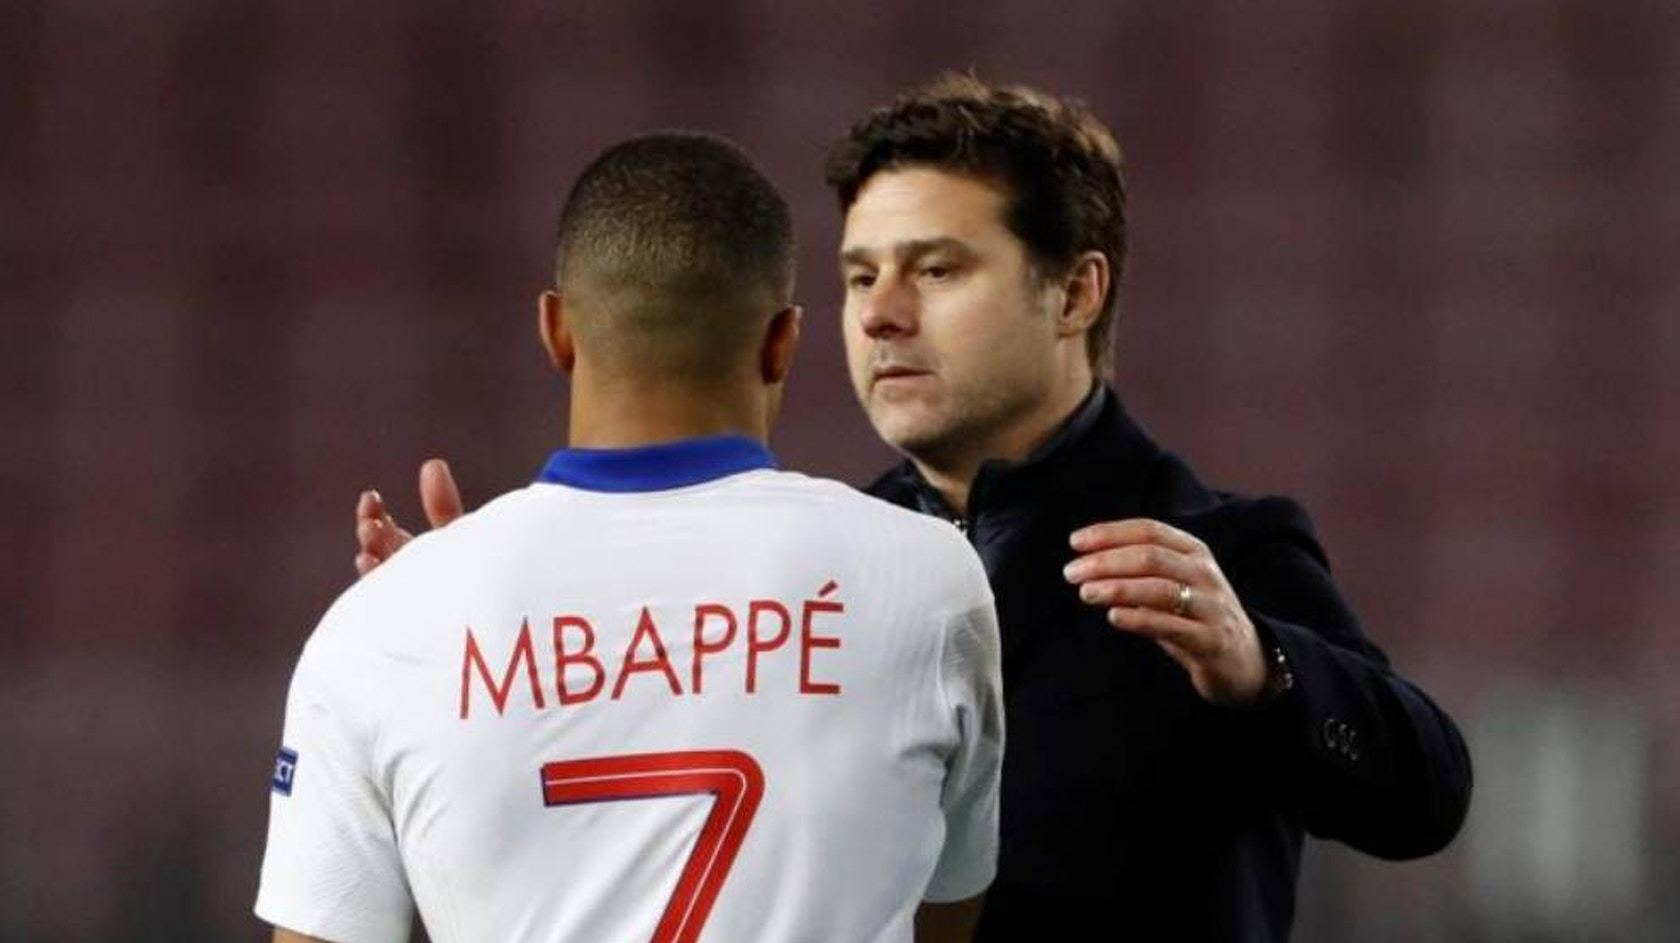 Mbappe hỏi Pochettino về Premier League và luyện tiếng Anh mọi lúc